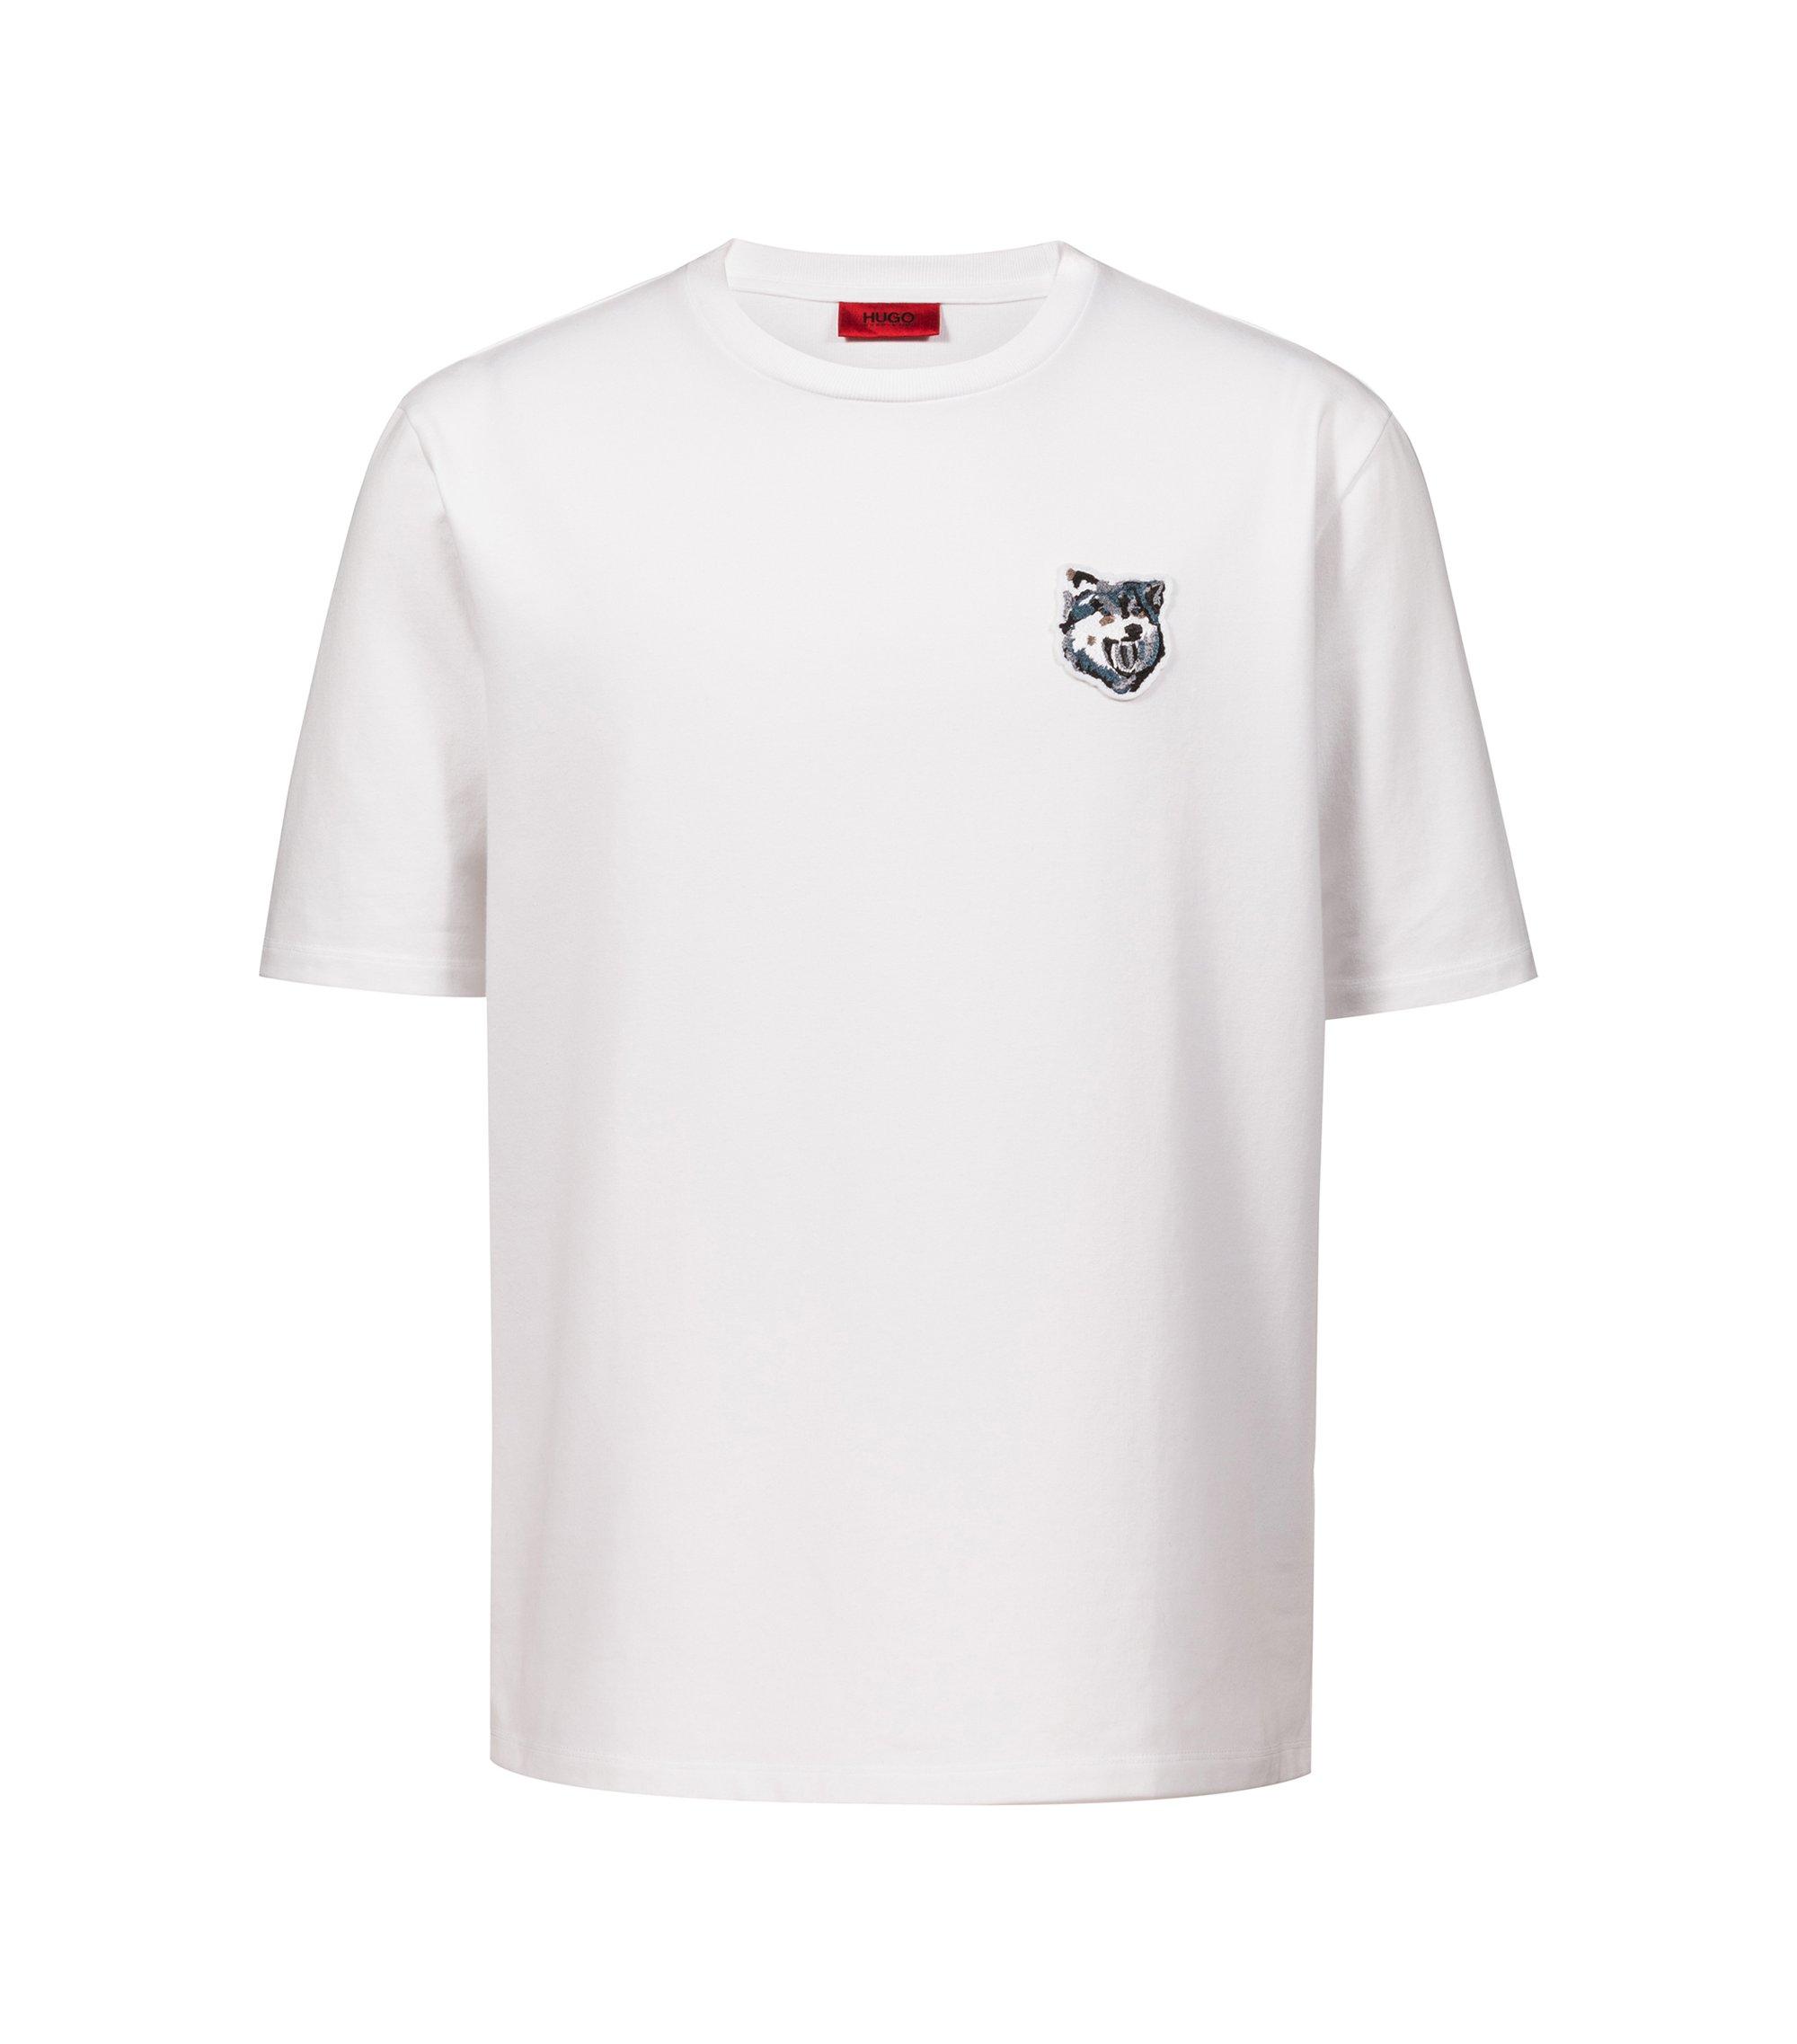 T-shirt Oversized Fit en doux French Terry avec badge loup, Blanc